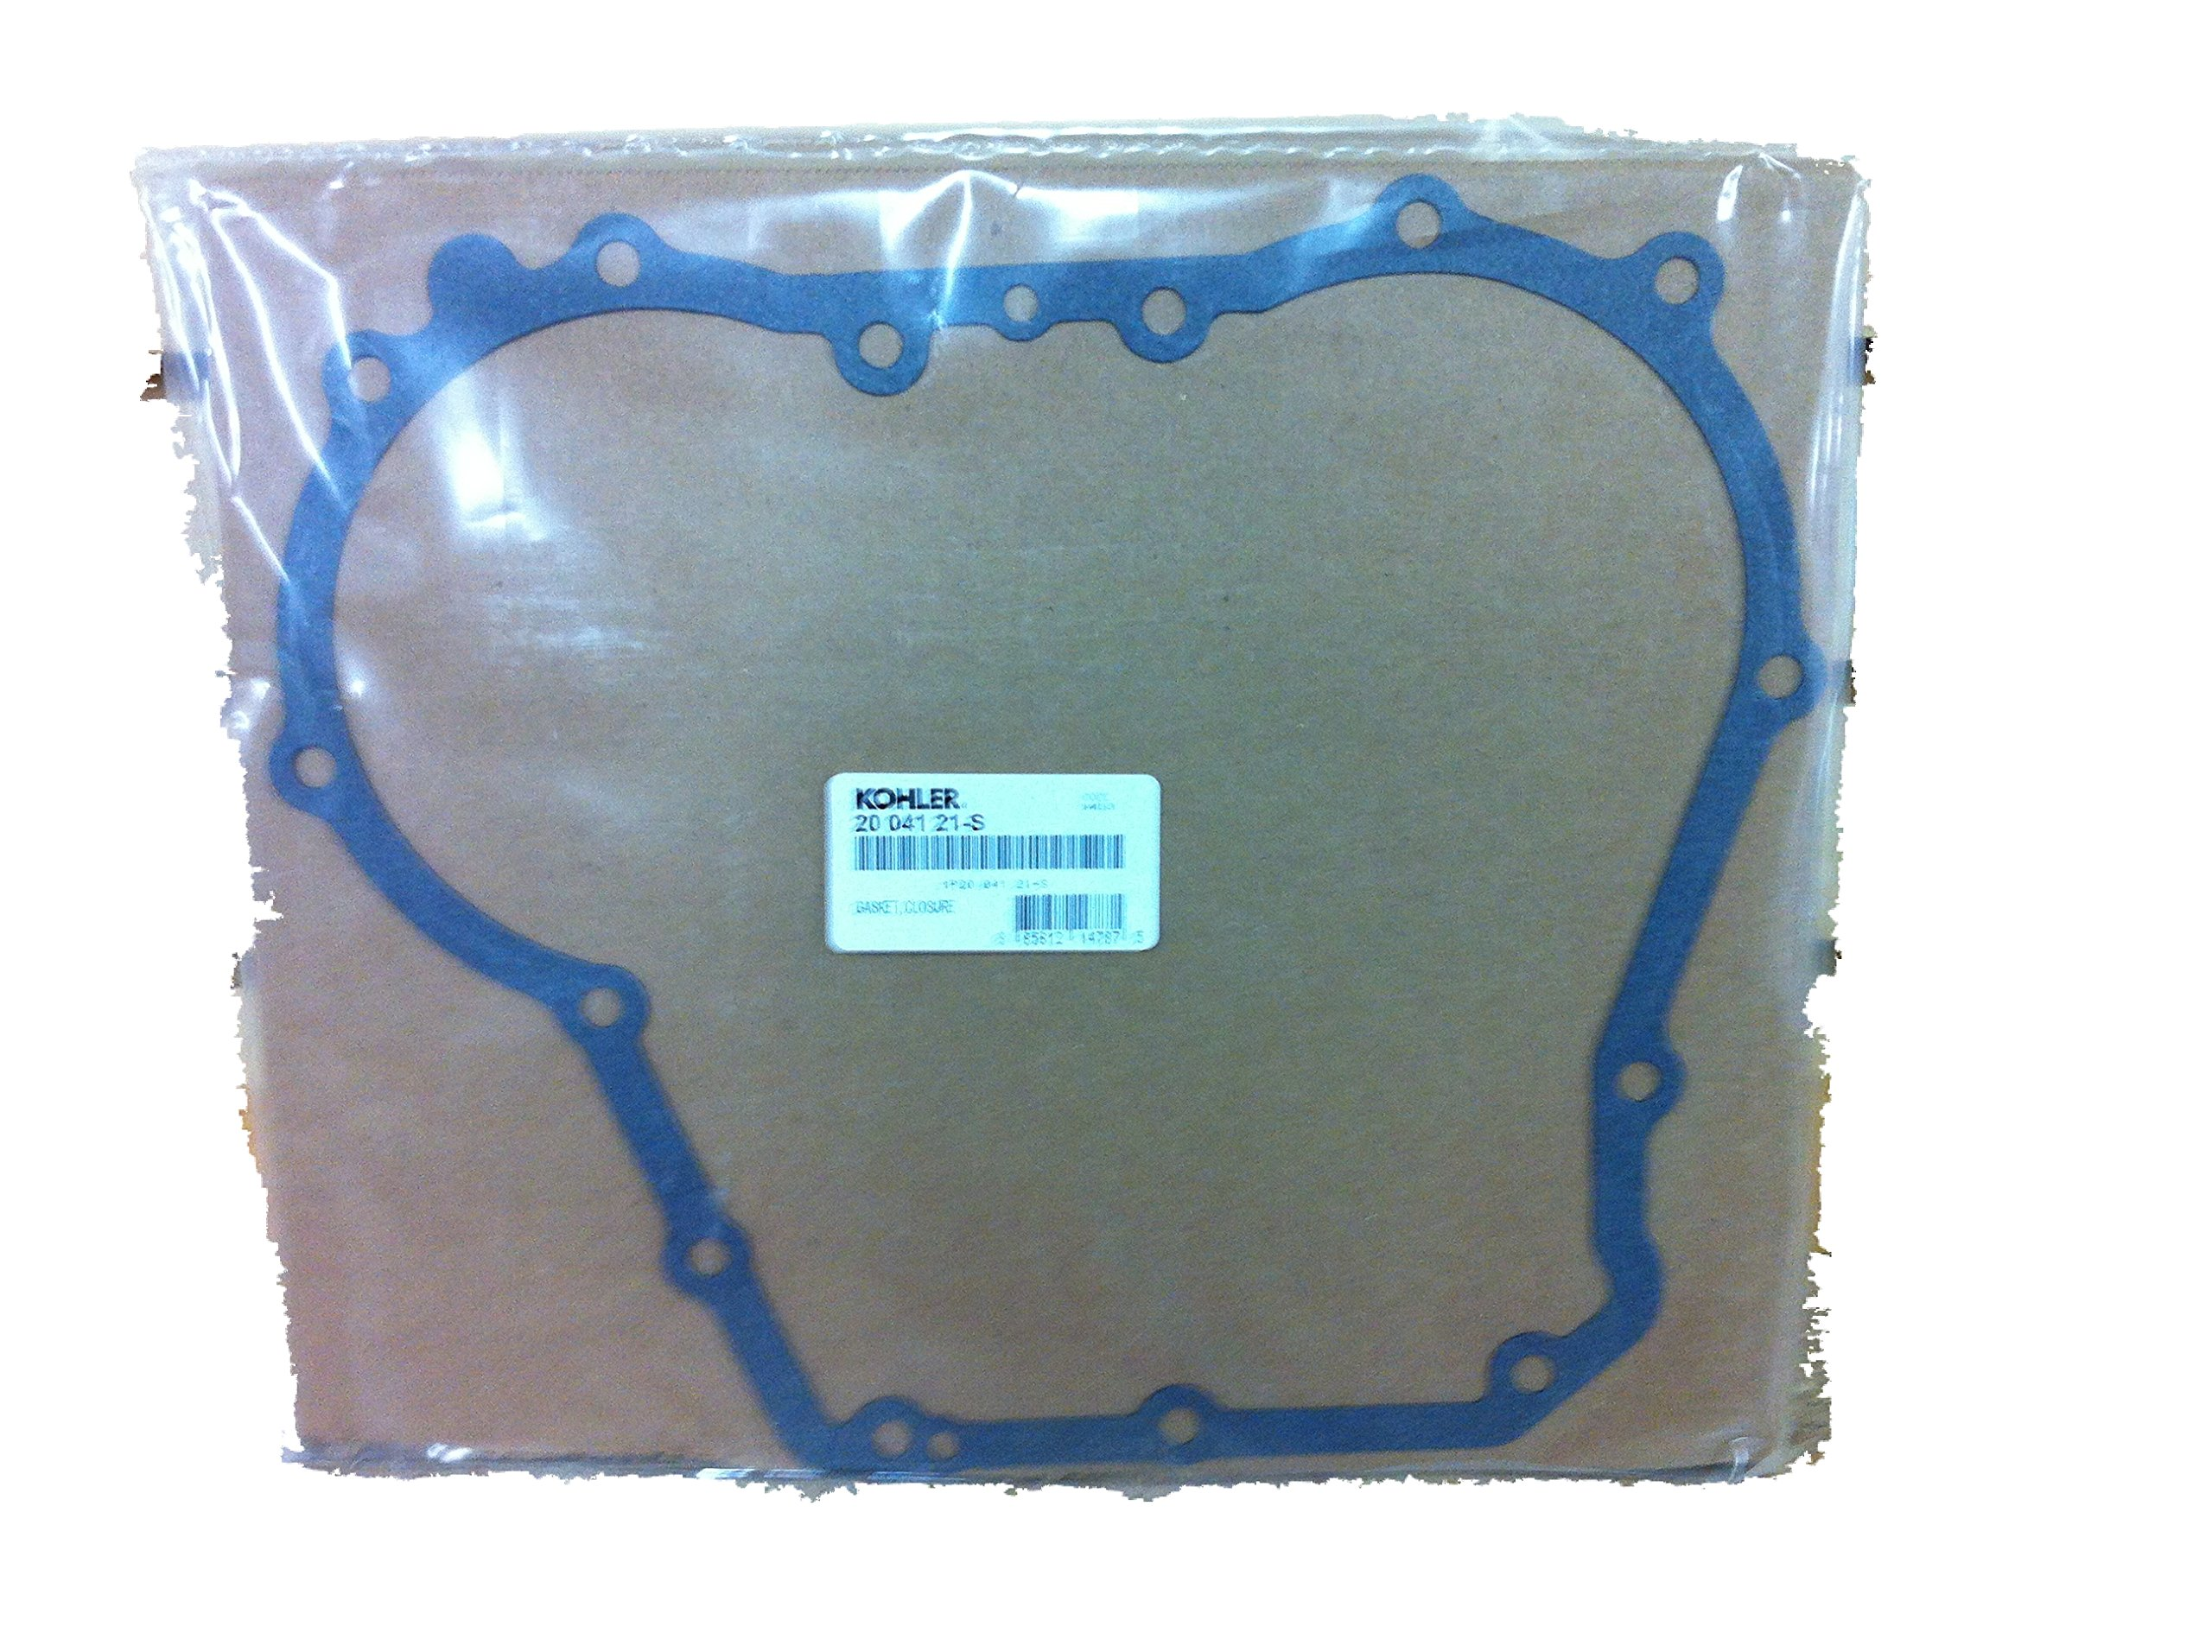 Genuine Oem Kohler Parts Gasket Closure Plate 20 041 Courage Engine Diagram 21 S Garden Outdoor